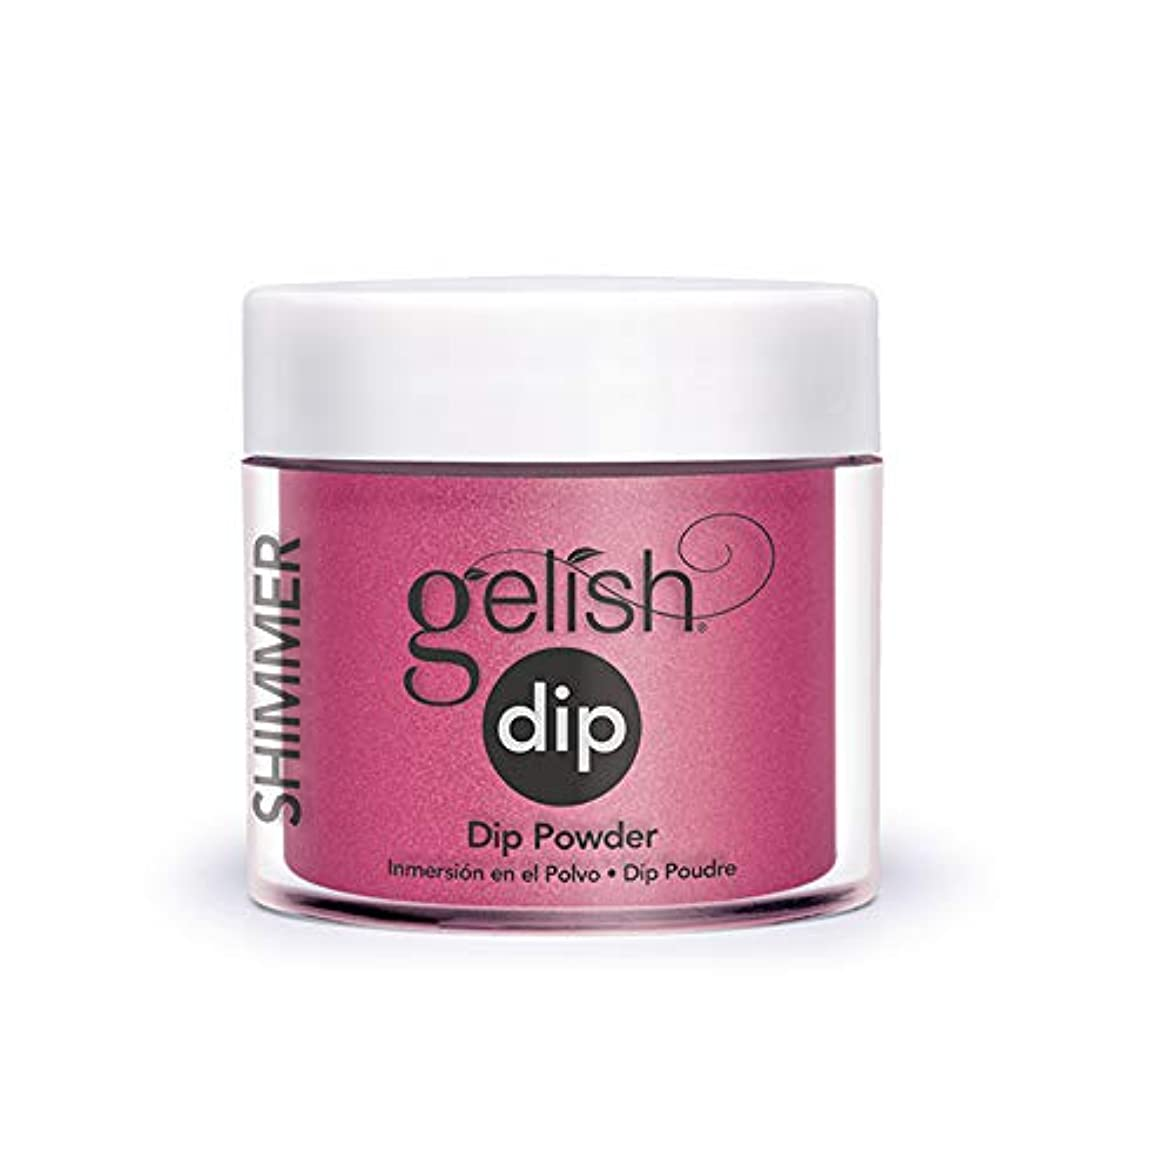 Harmony Gelish - Acrylic Dip Powder - Warm Up the Car-Nation - 23g / 0.8oz